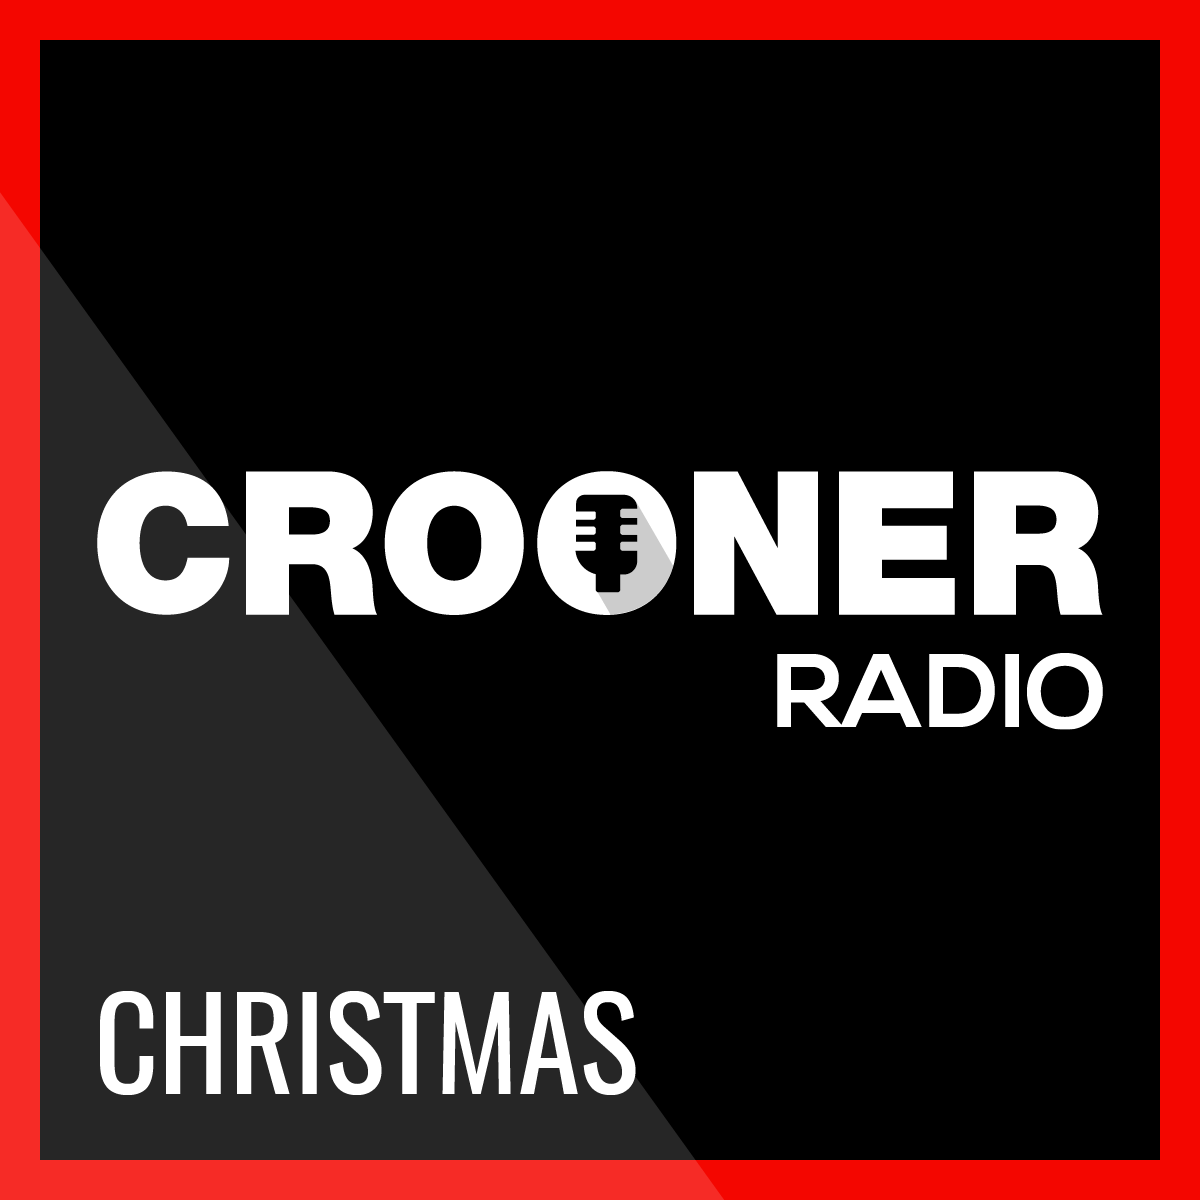 Christmas Radio Station.Crooner Radio Christmas Radioguide Fm